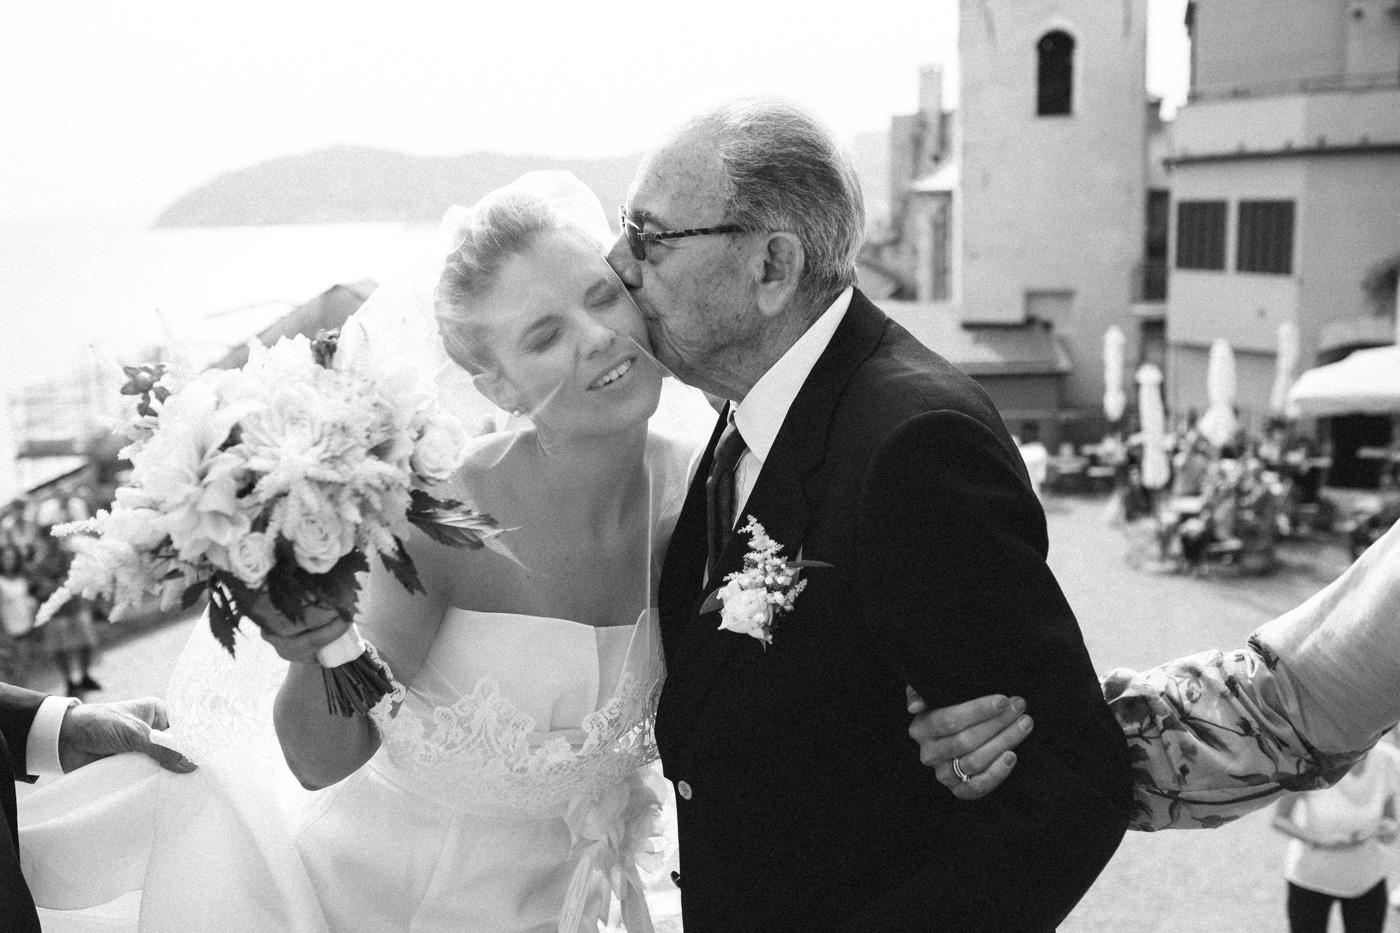 matrimoni_all_italiana_fotografo_matrimonio_cinque_terre-26.jpg